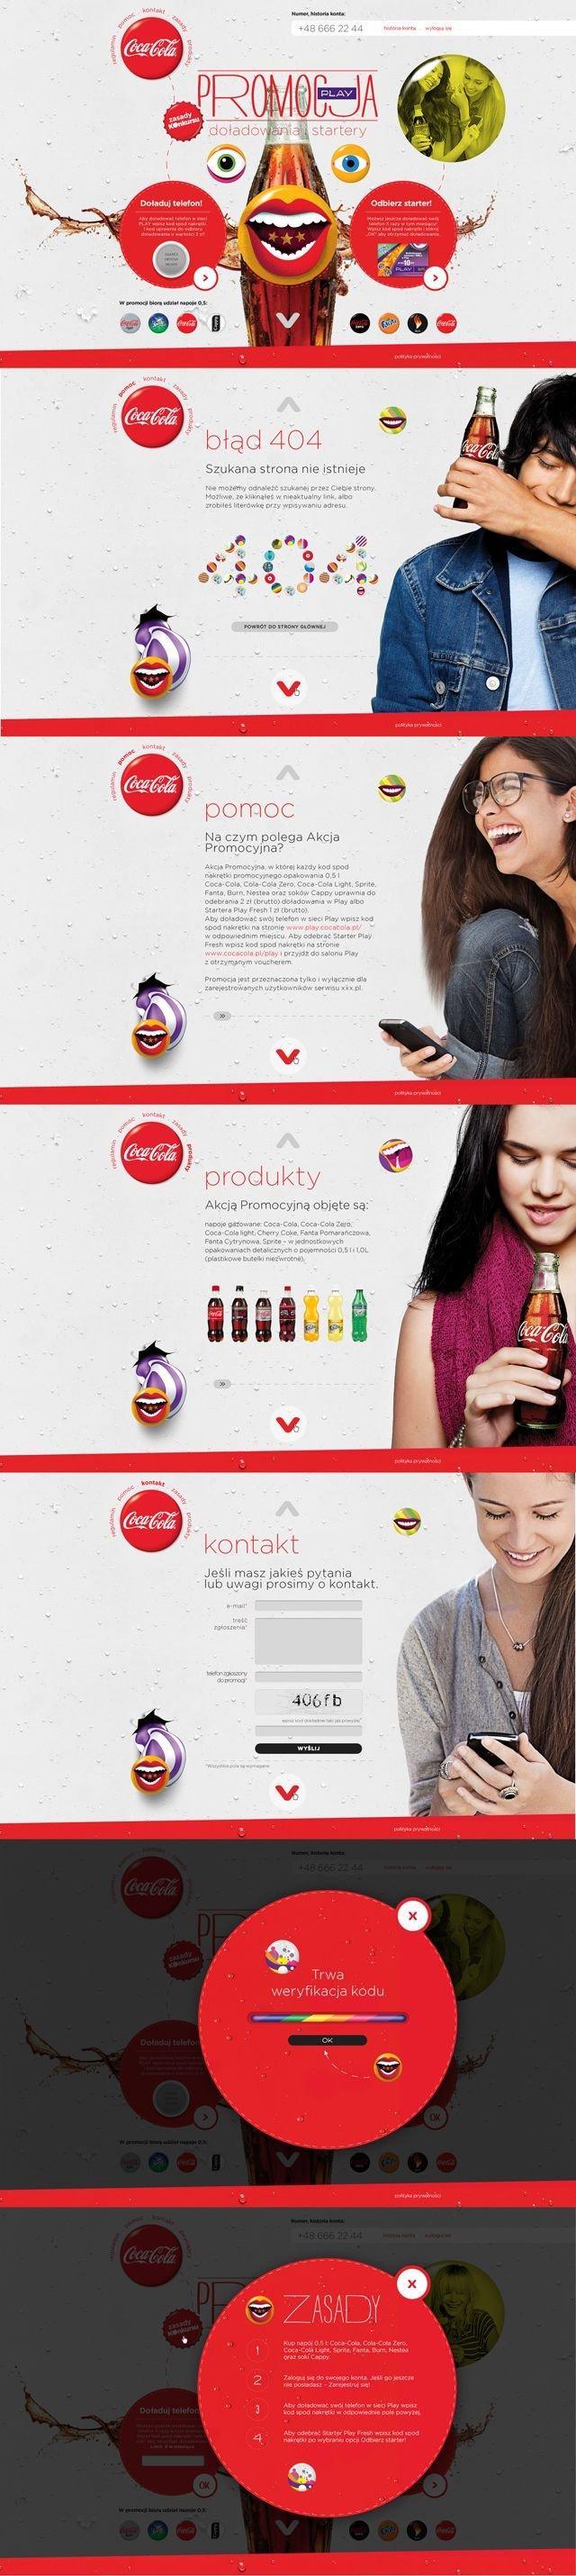 Coca-cola top promo with play